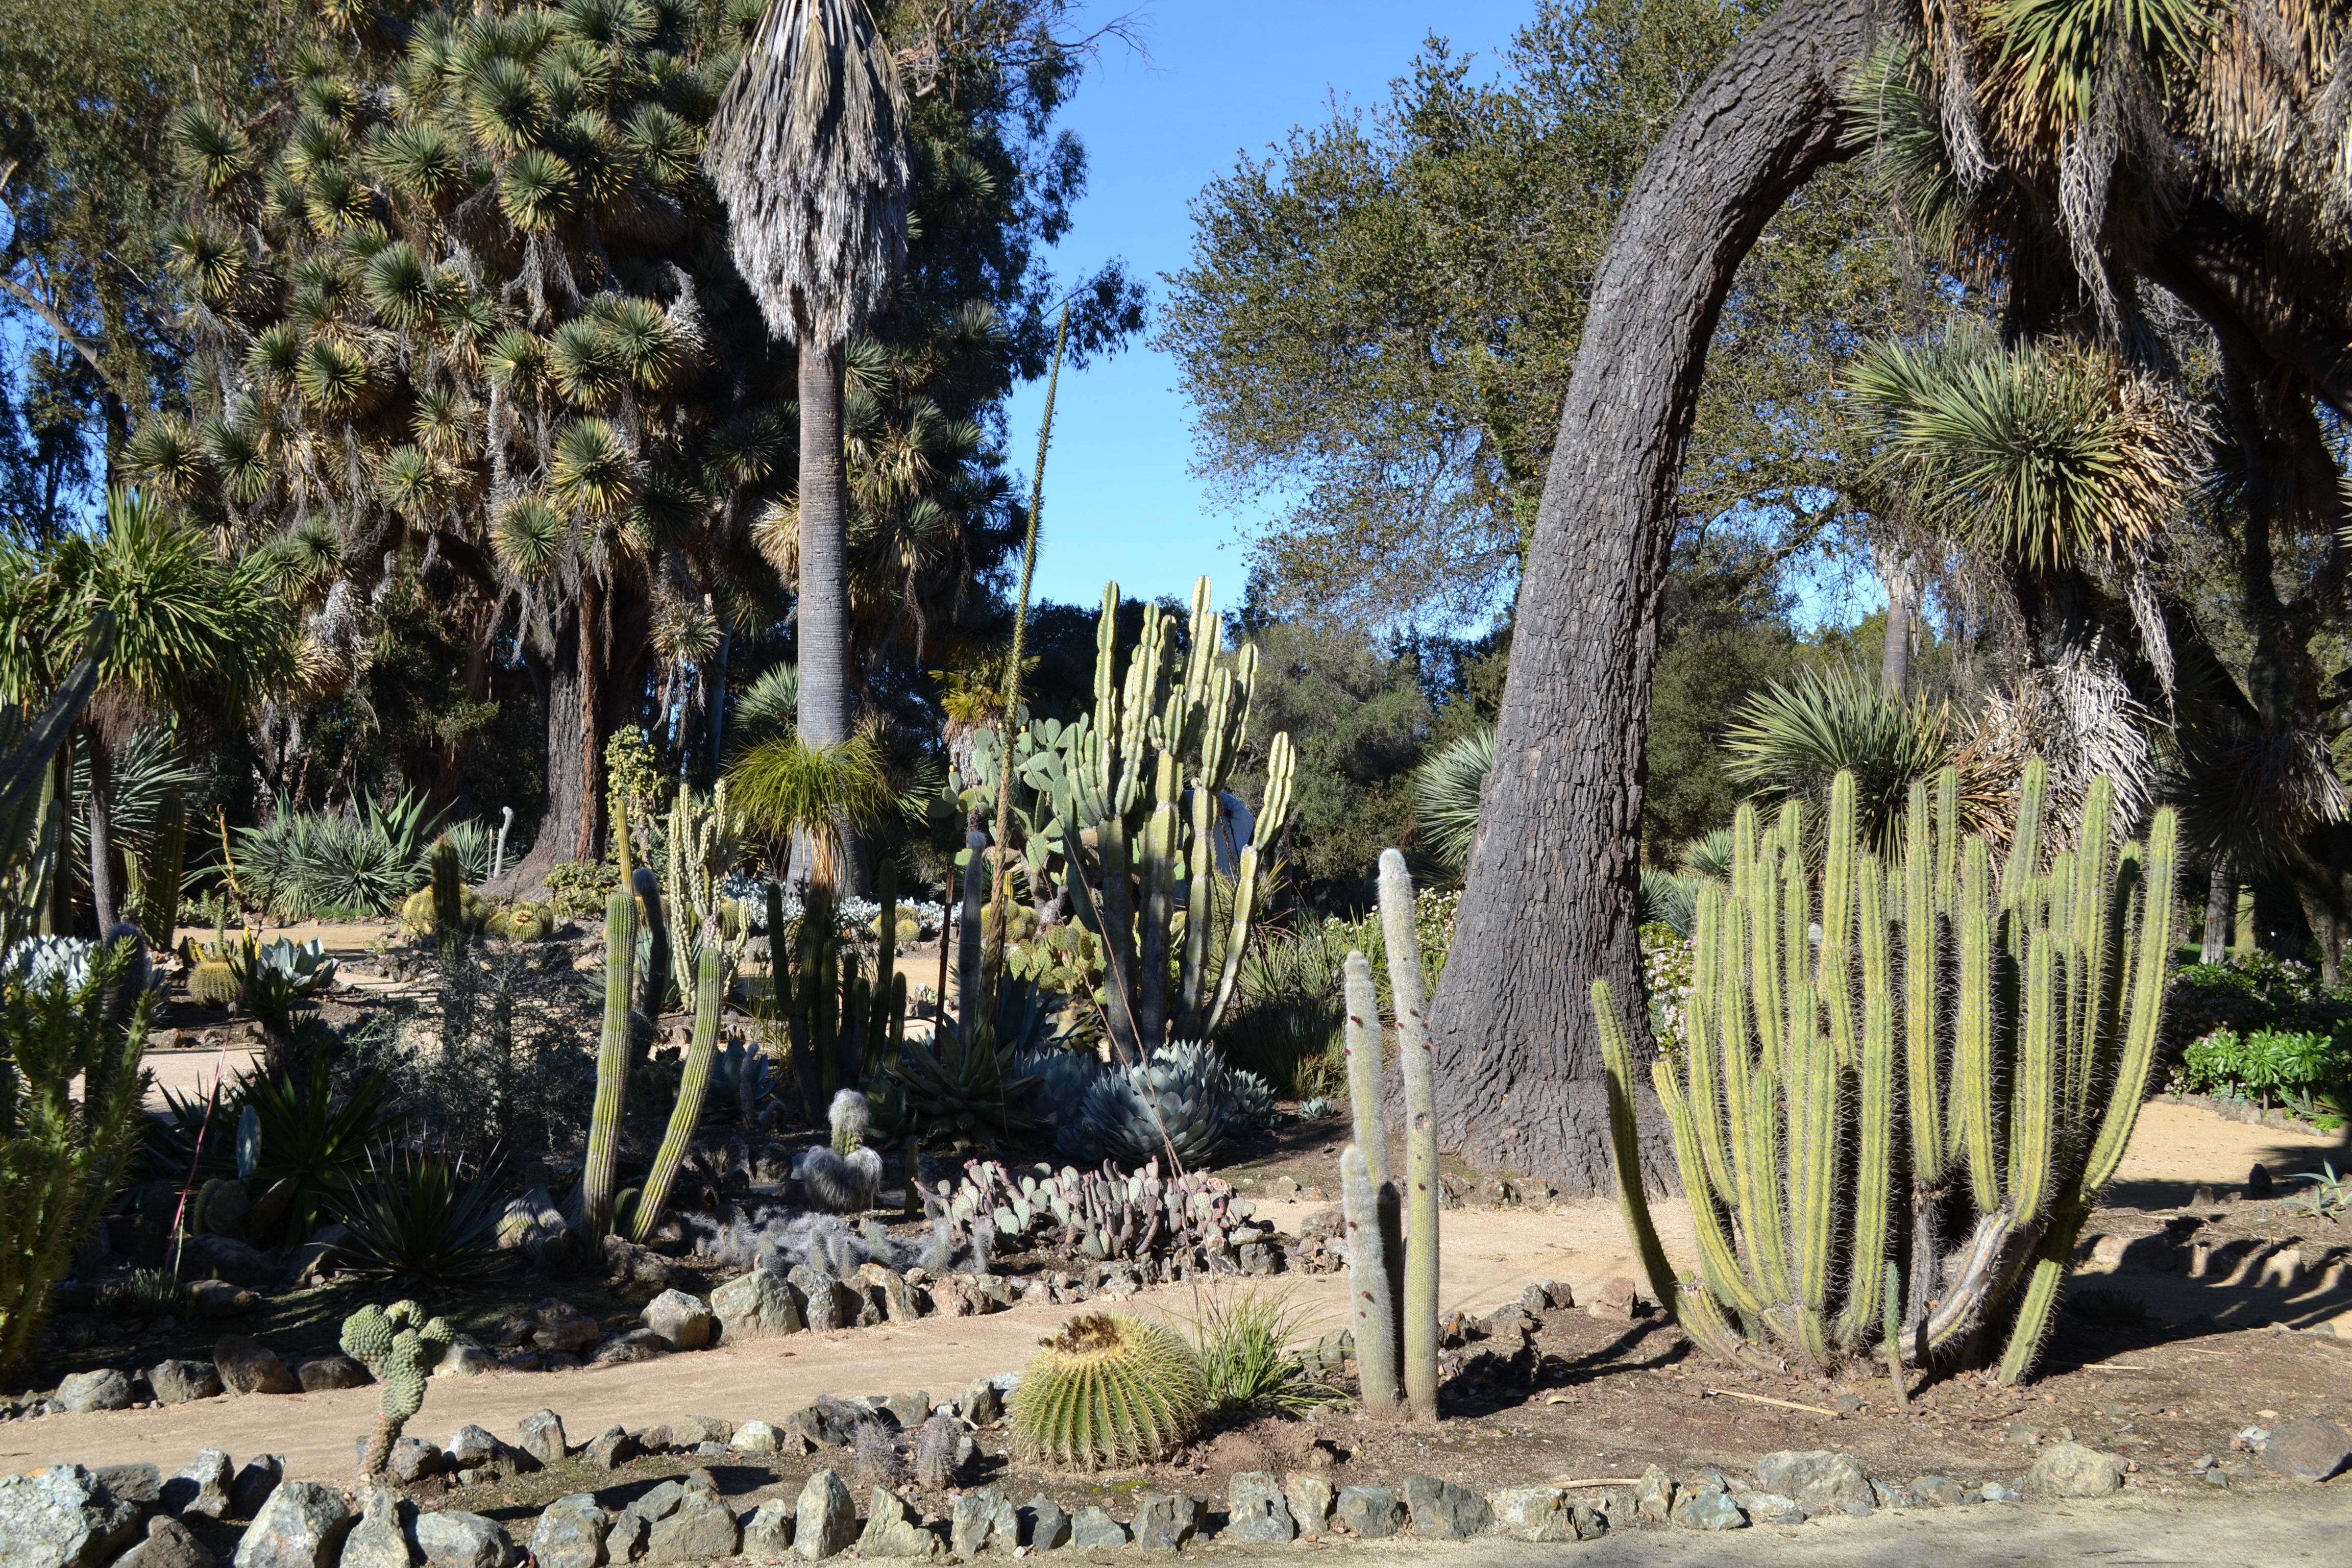 Merveilleux File:Arizona Cactus Garden At Stanford University 1.JPG